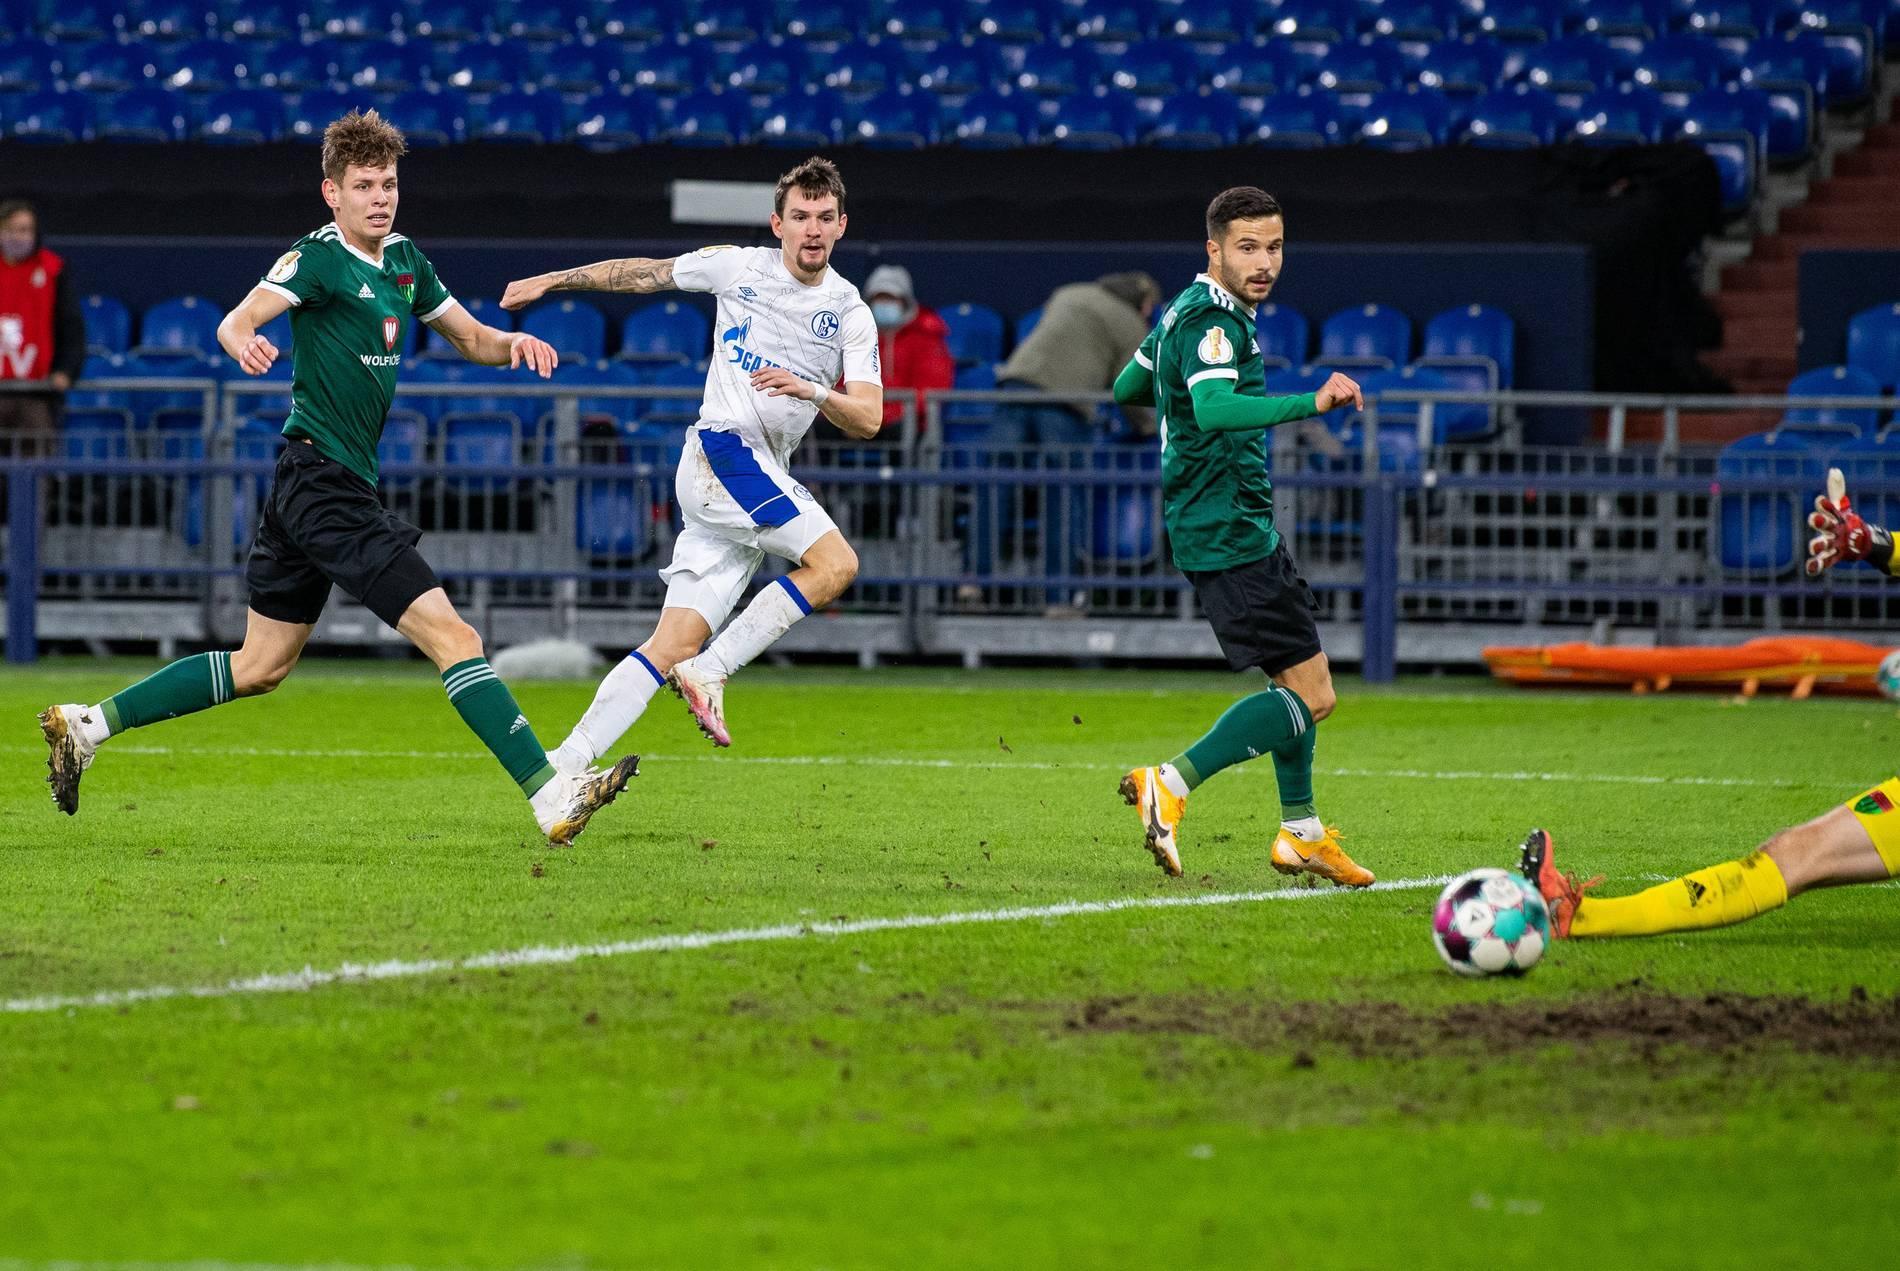 Schalke runderneuert gegen Schweinfurt - Fährmann im Tor